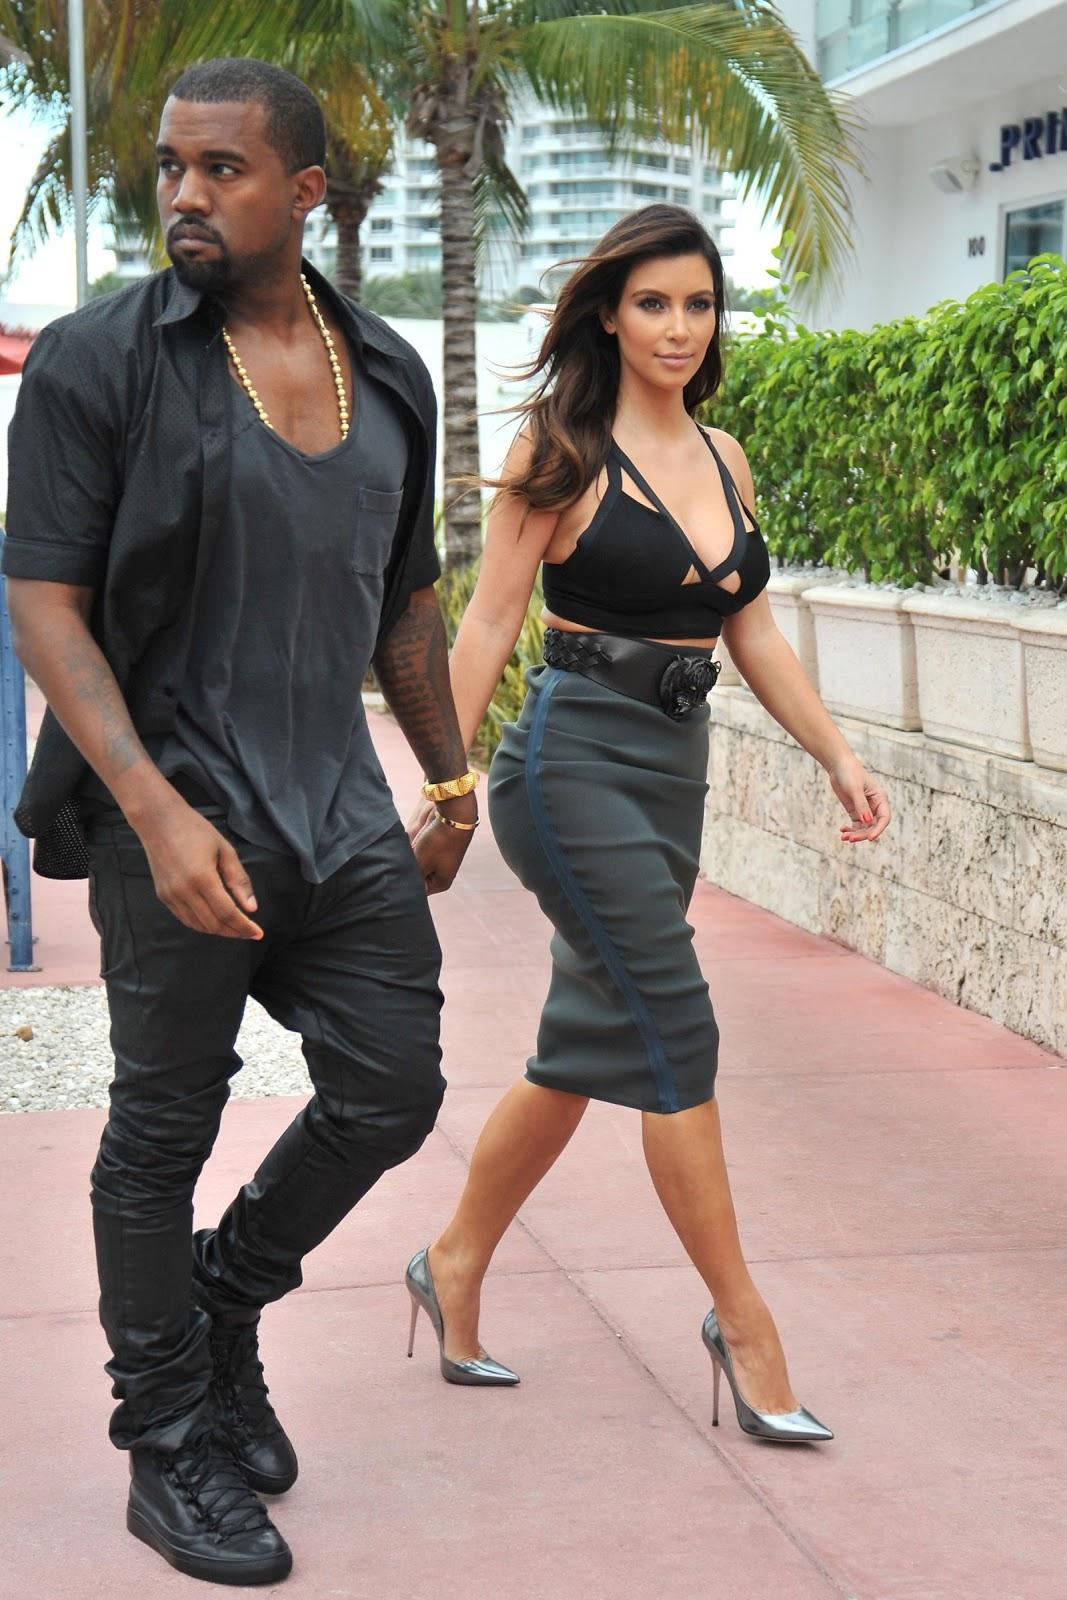 http://1.bp.blogspot.com/--mYxnQvIbto/UHxKuAh7N2I/AAAAAAAAJeo/2ATT4WyR0rM/s1600/Kim-Kardashian-132.jpg